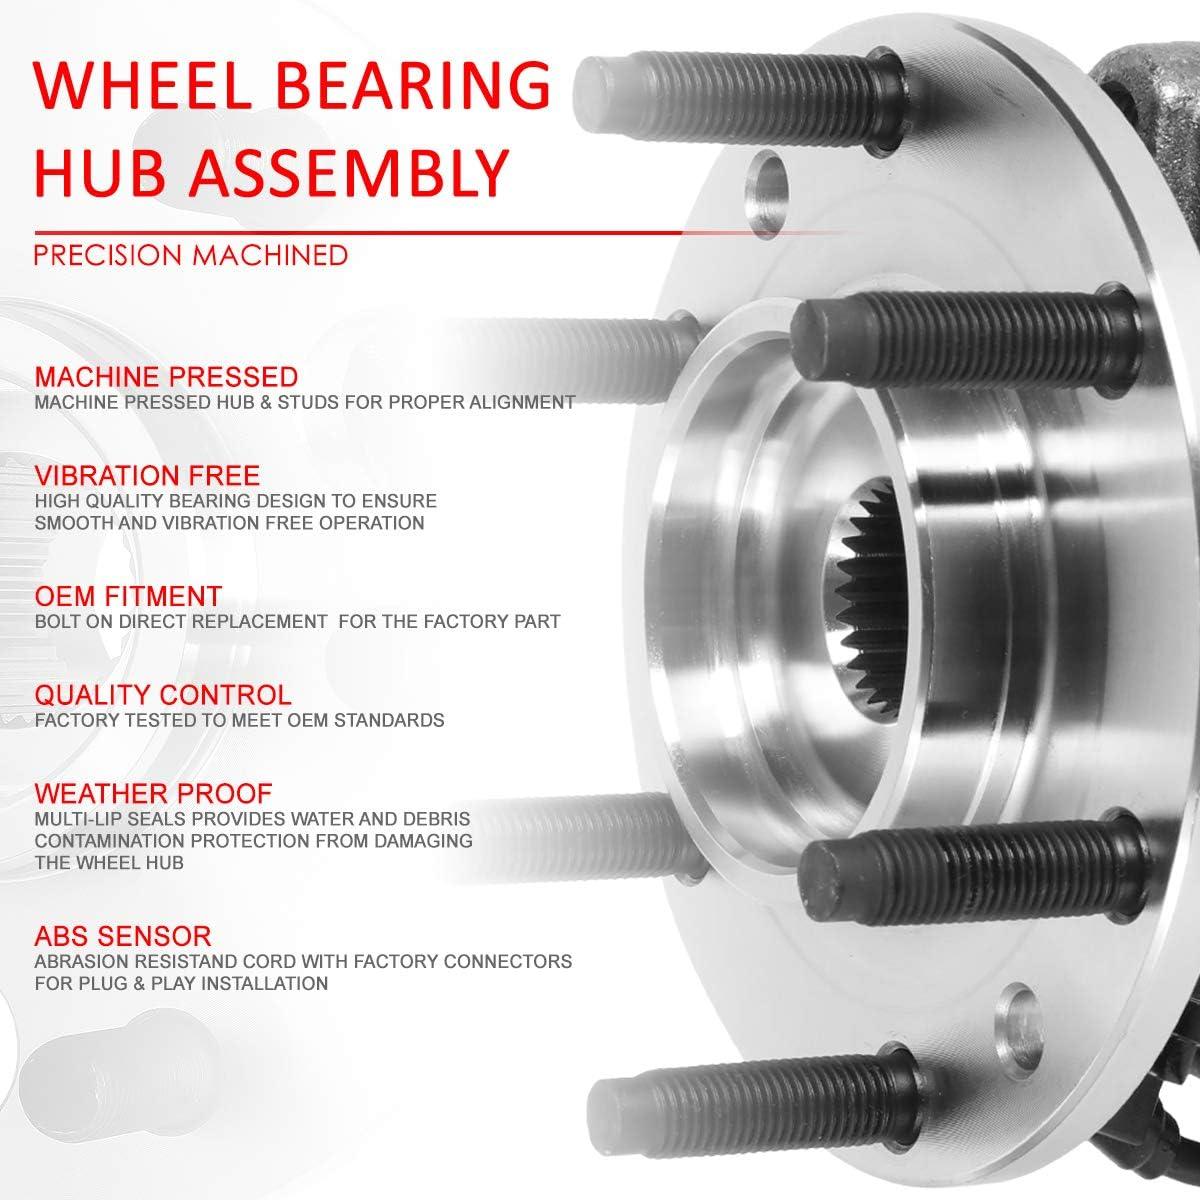 DNA Motoring OE-WHA-006 Semi-Polished Steel Wheel Bearing Hub Assembly 515050 For 02-05 Explorer Aviator Mountaineer